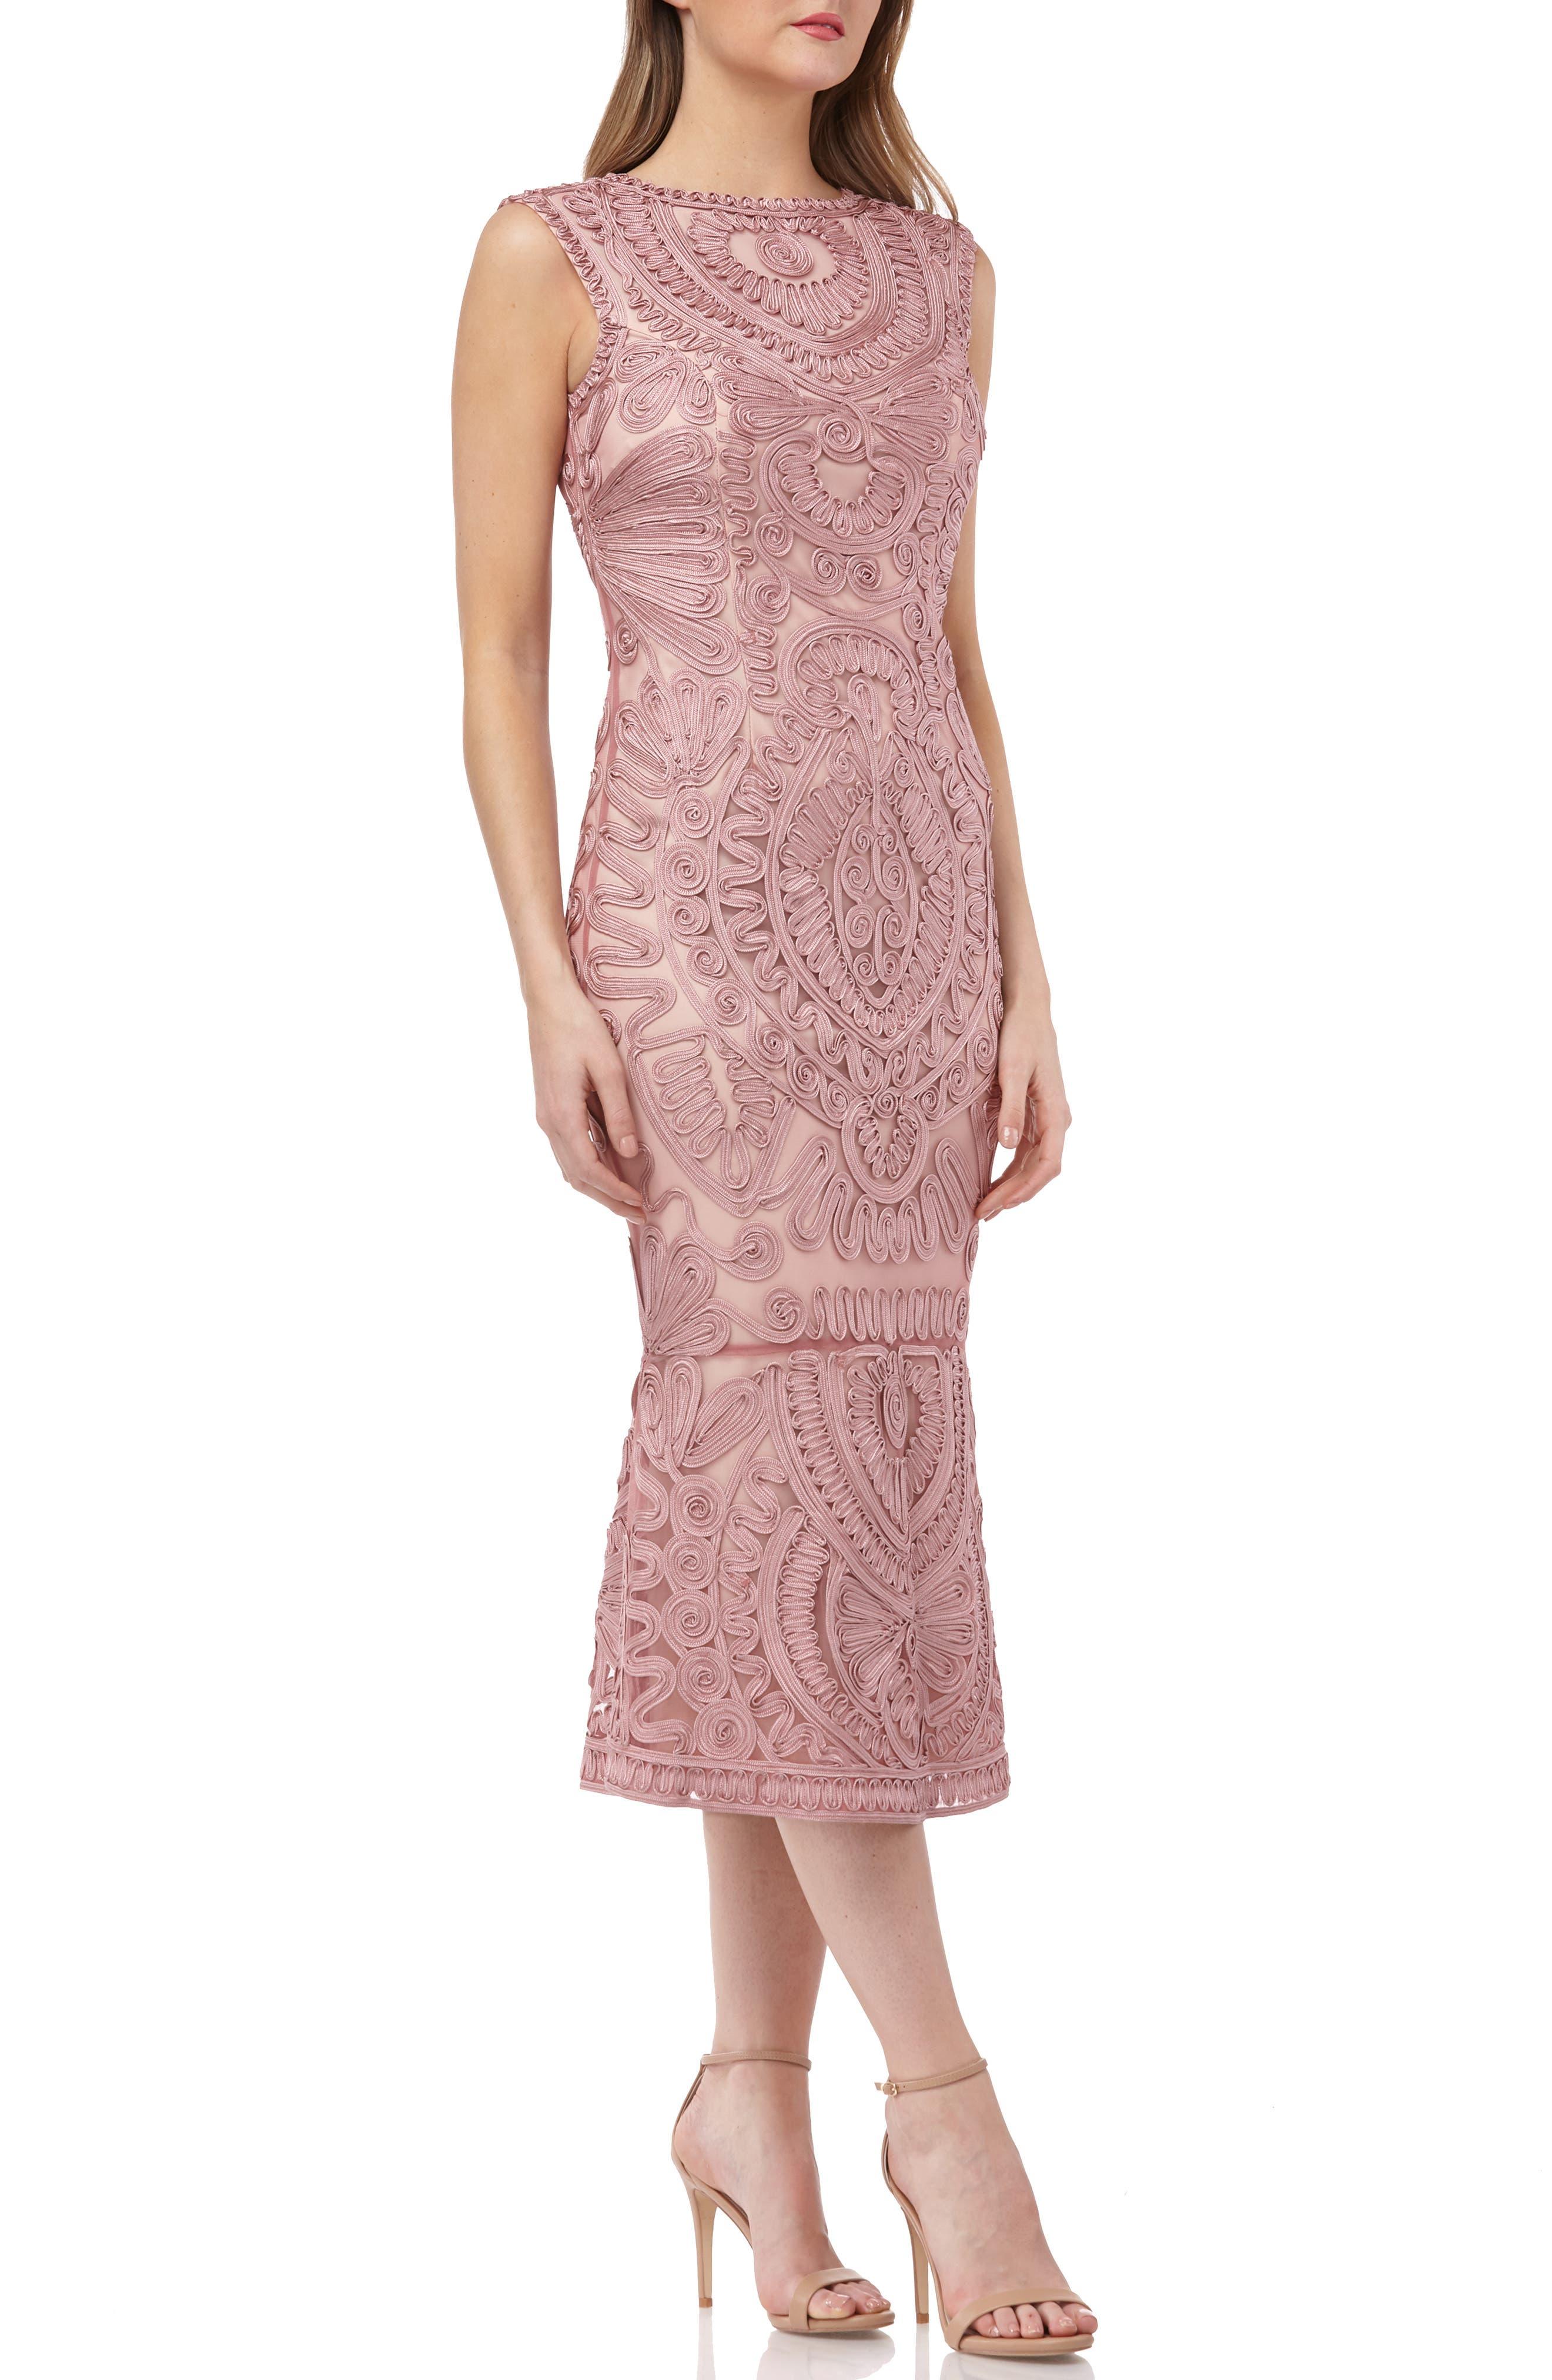 Js Collections Soutache Mesh Dress, Pink